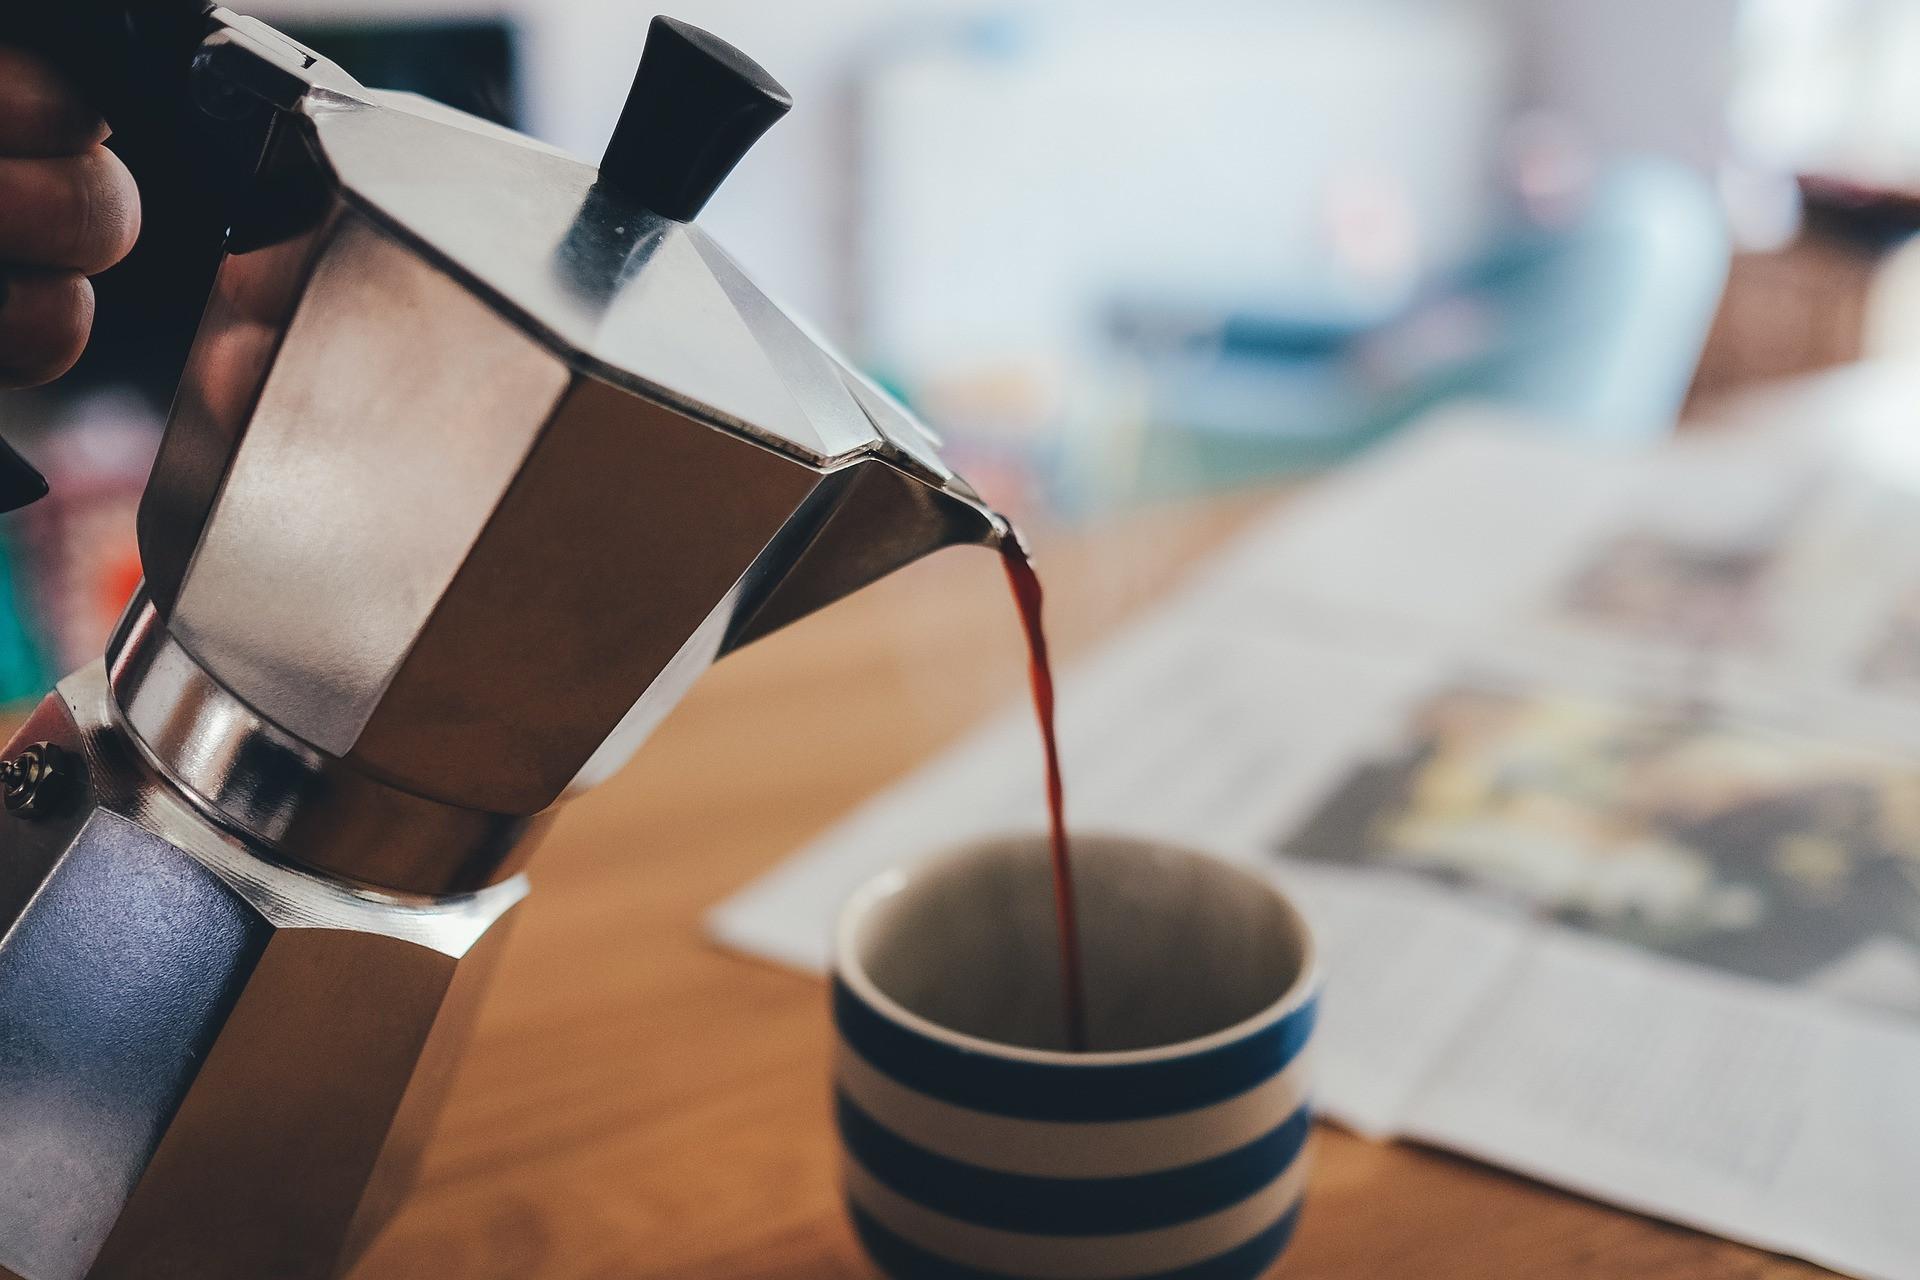 Bialetti koffie zetten